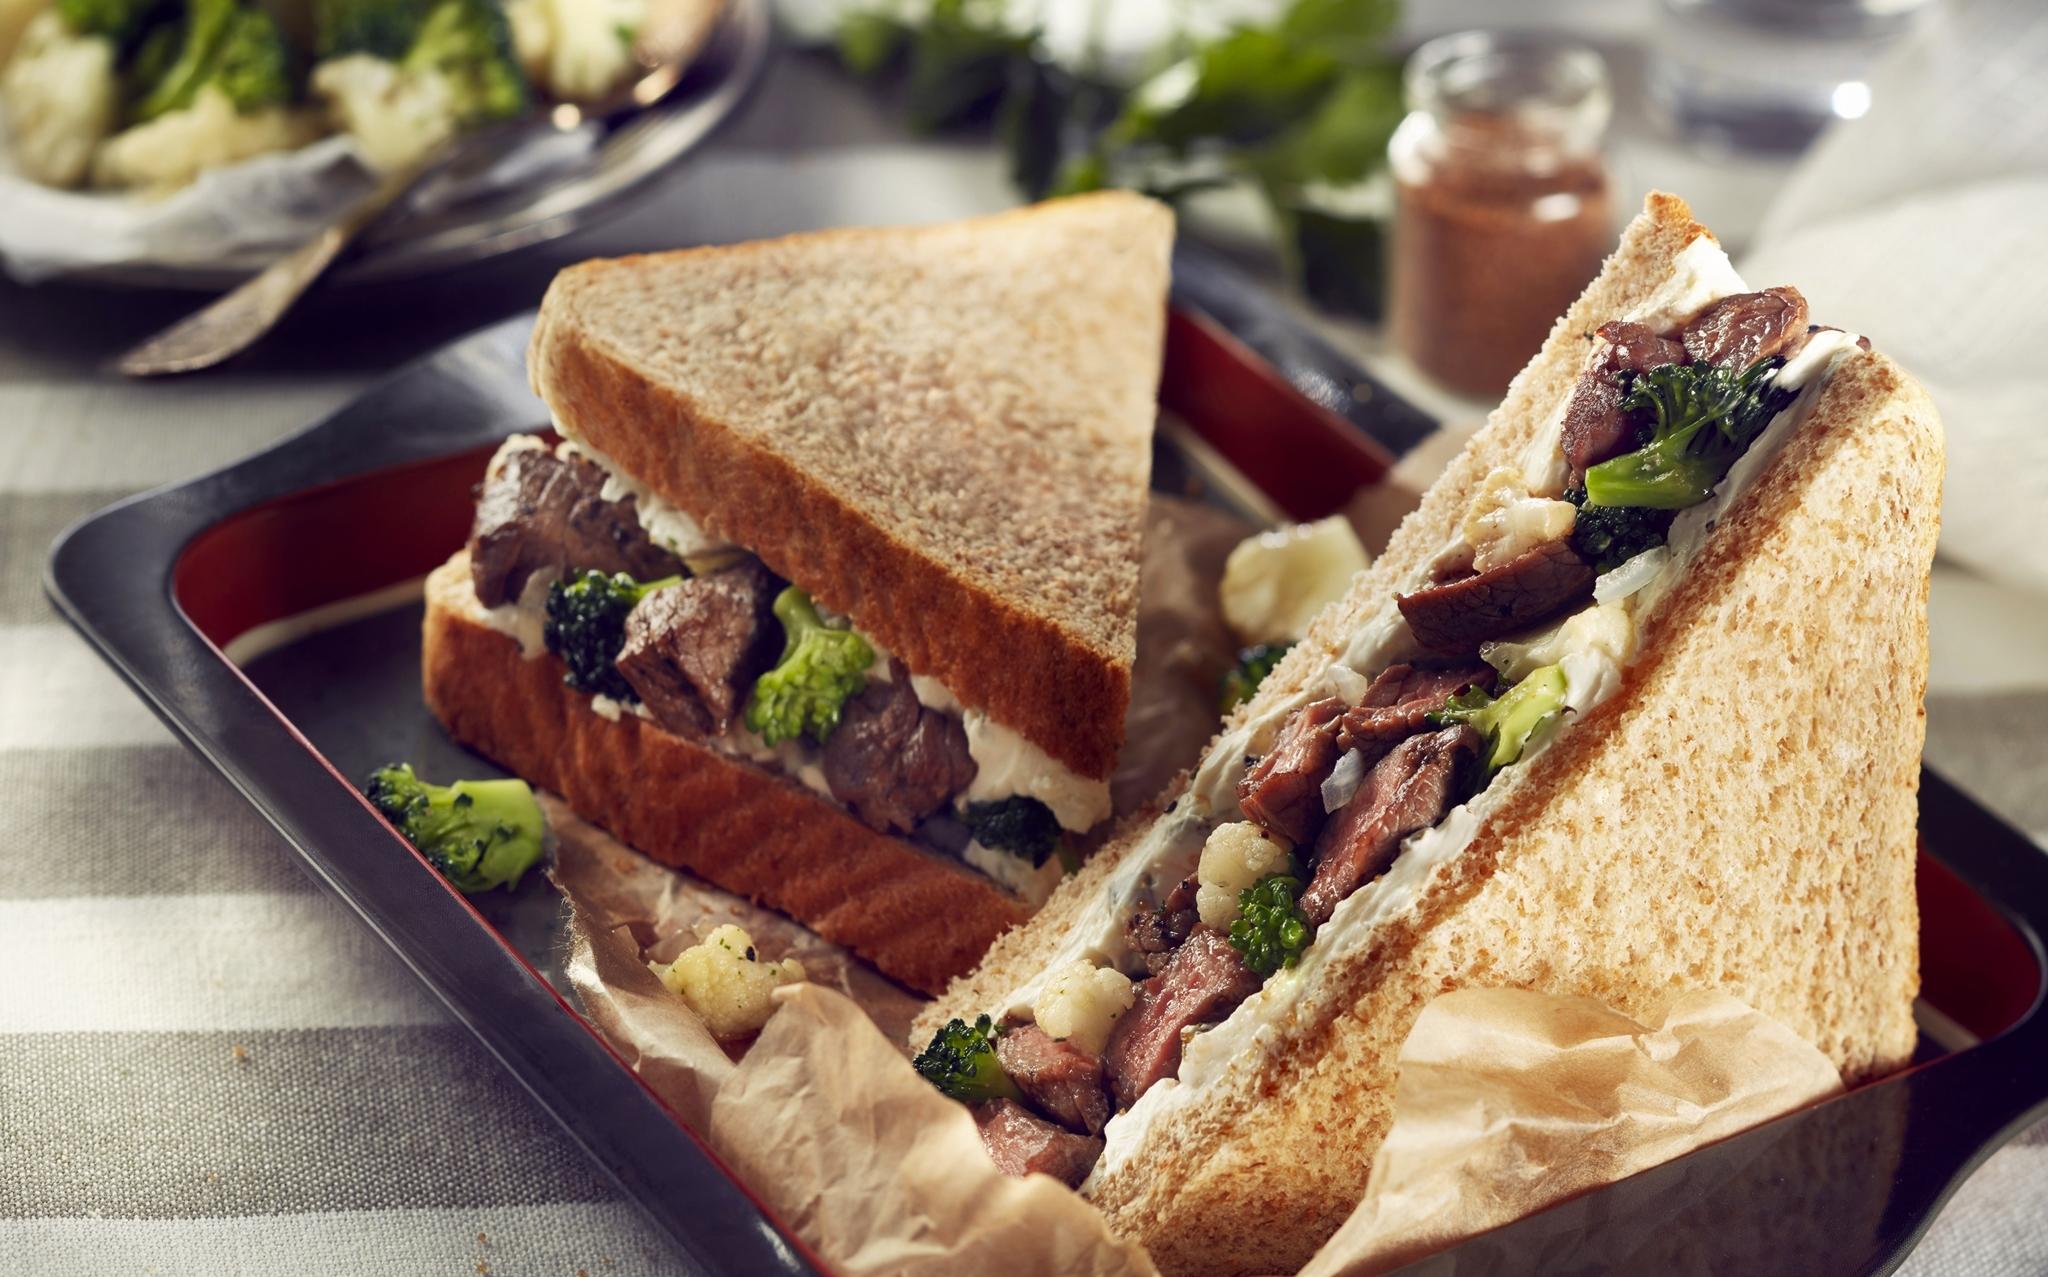 Sándwich de res Bimbo